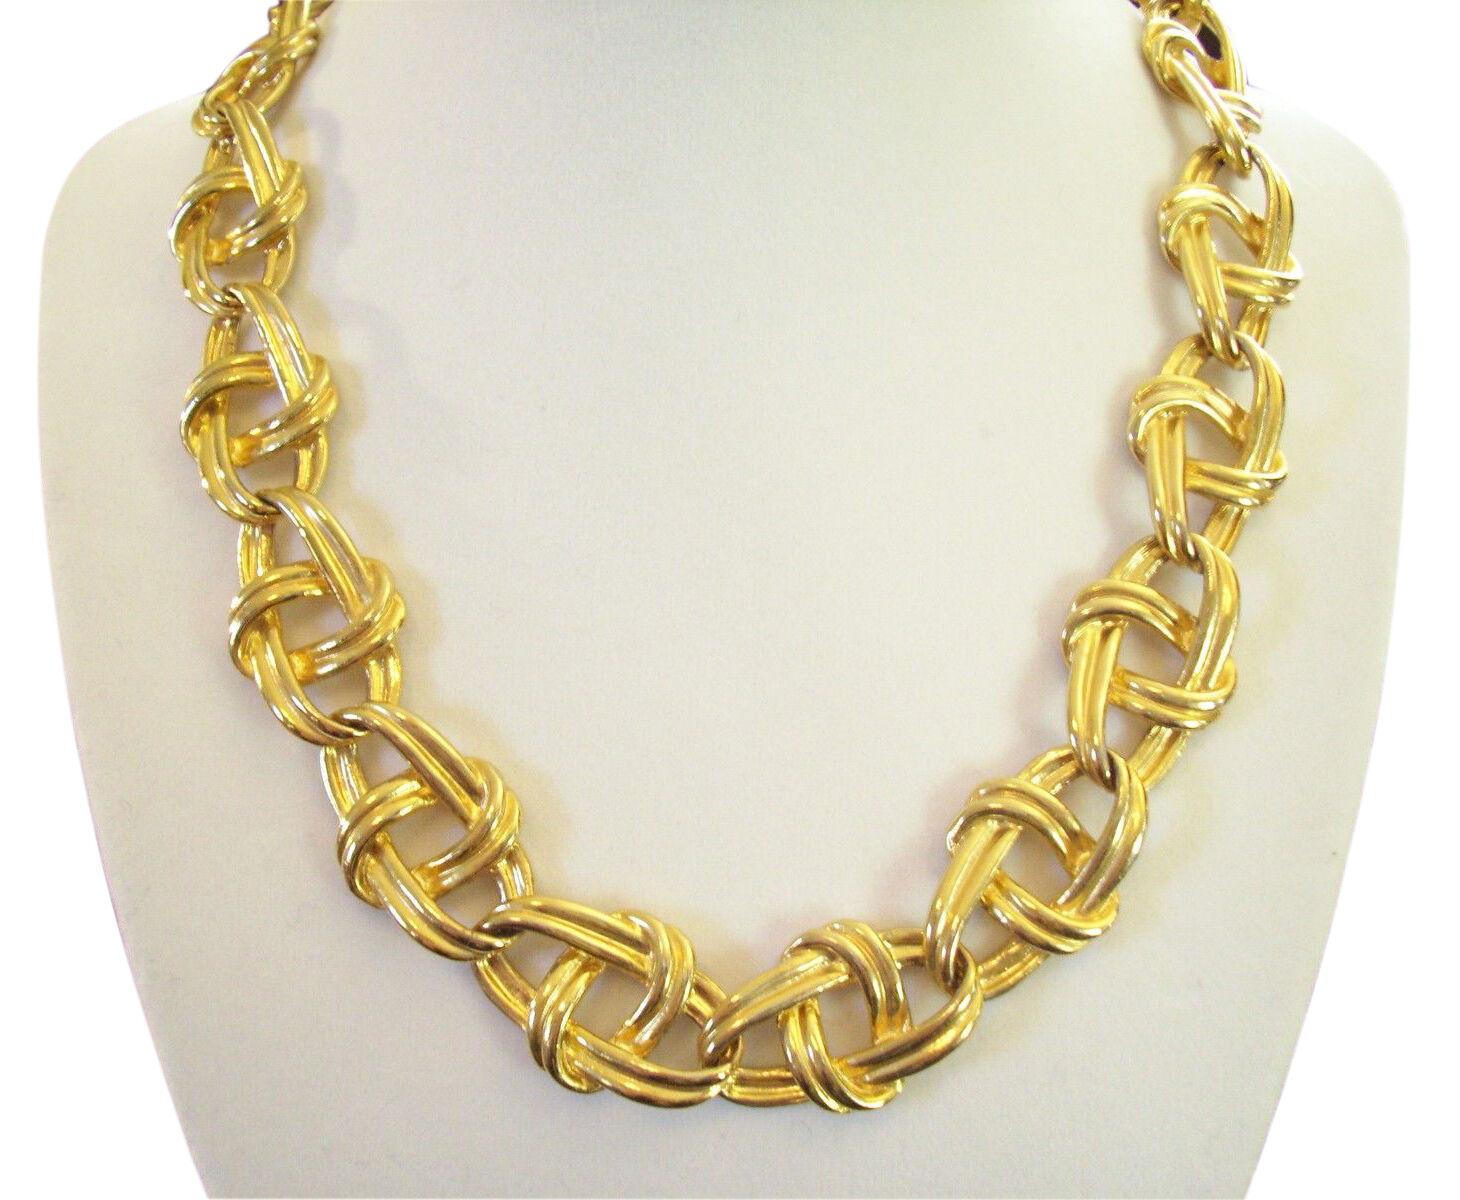 Top 10 Gold Necklace Designs | eBay